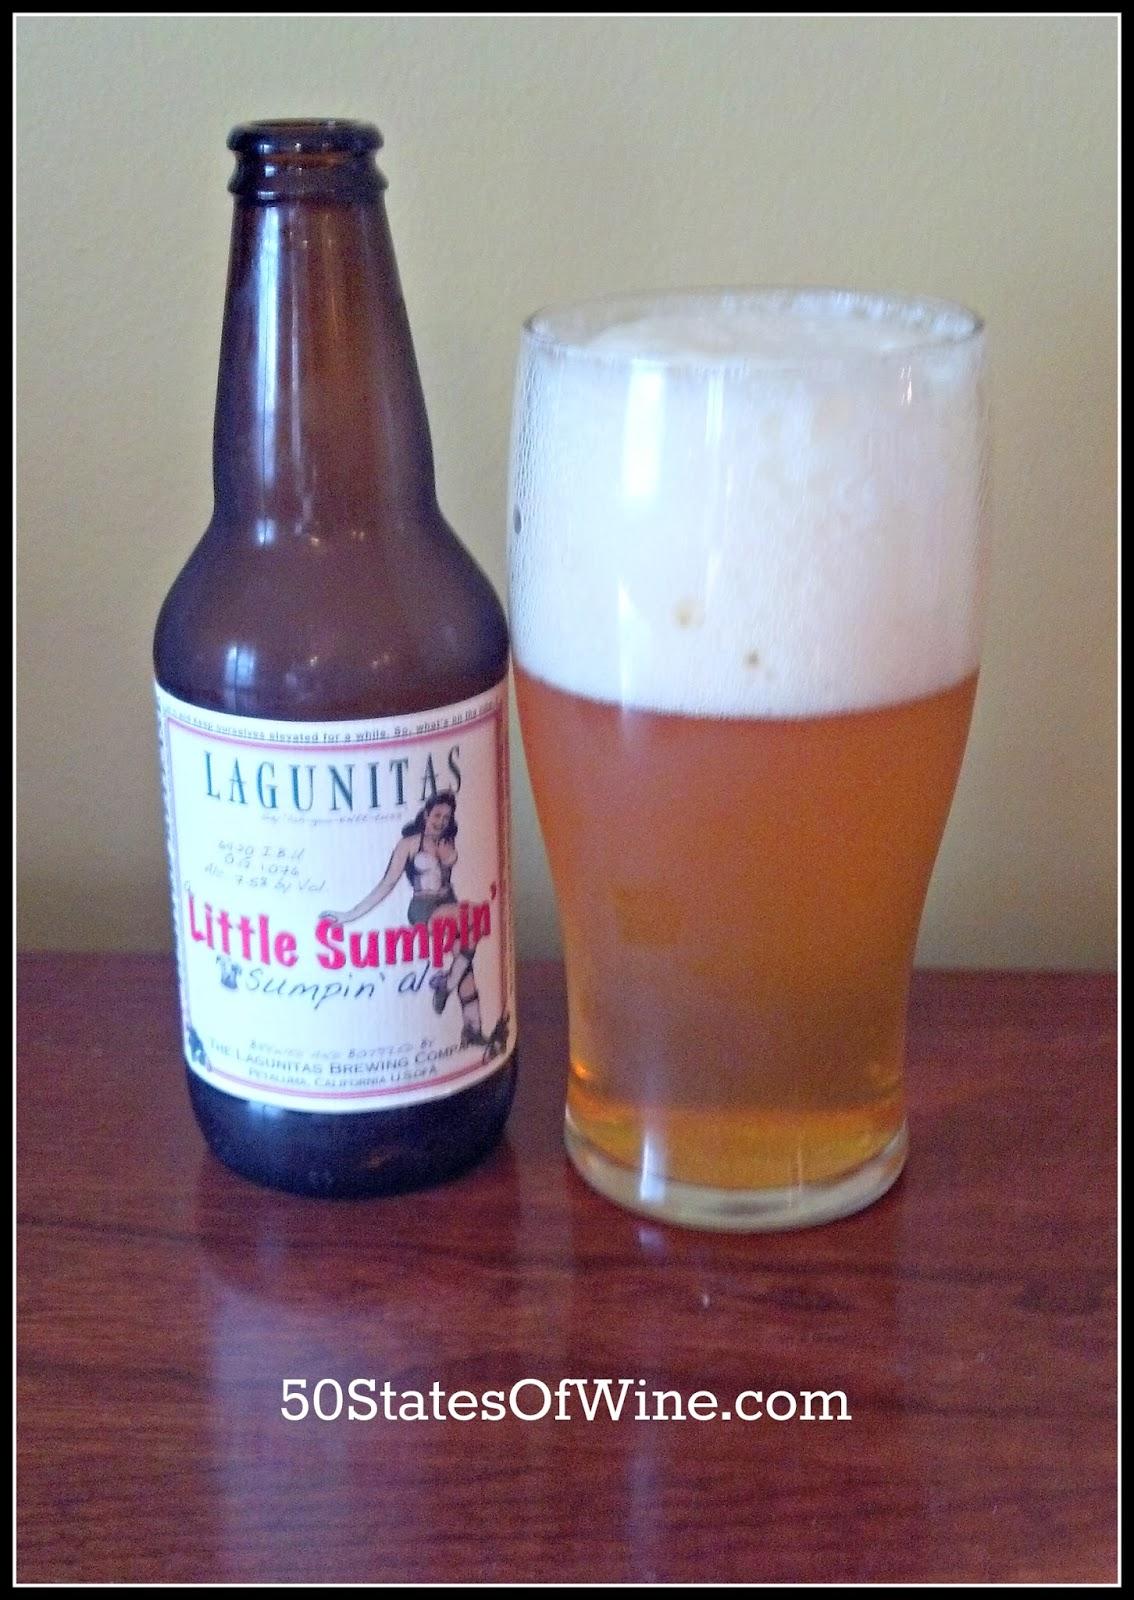 Lagunitas Brewing Company Little Sumpin' Sumpin'